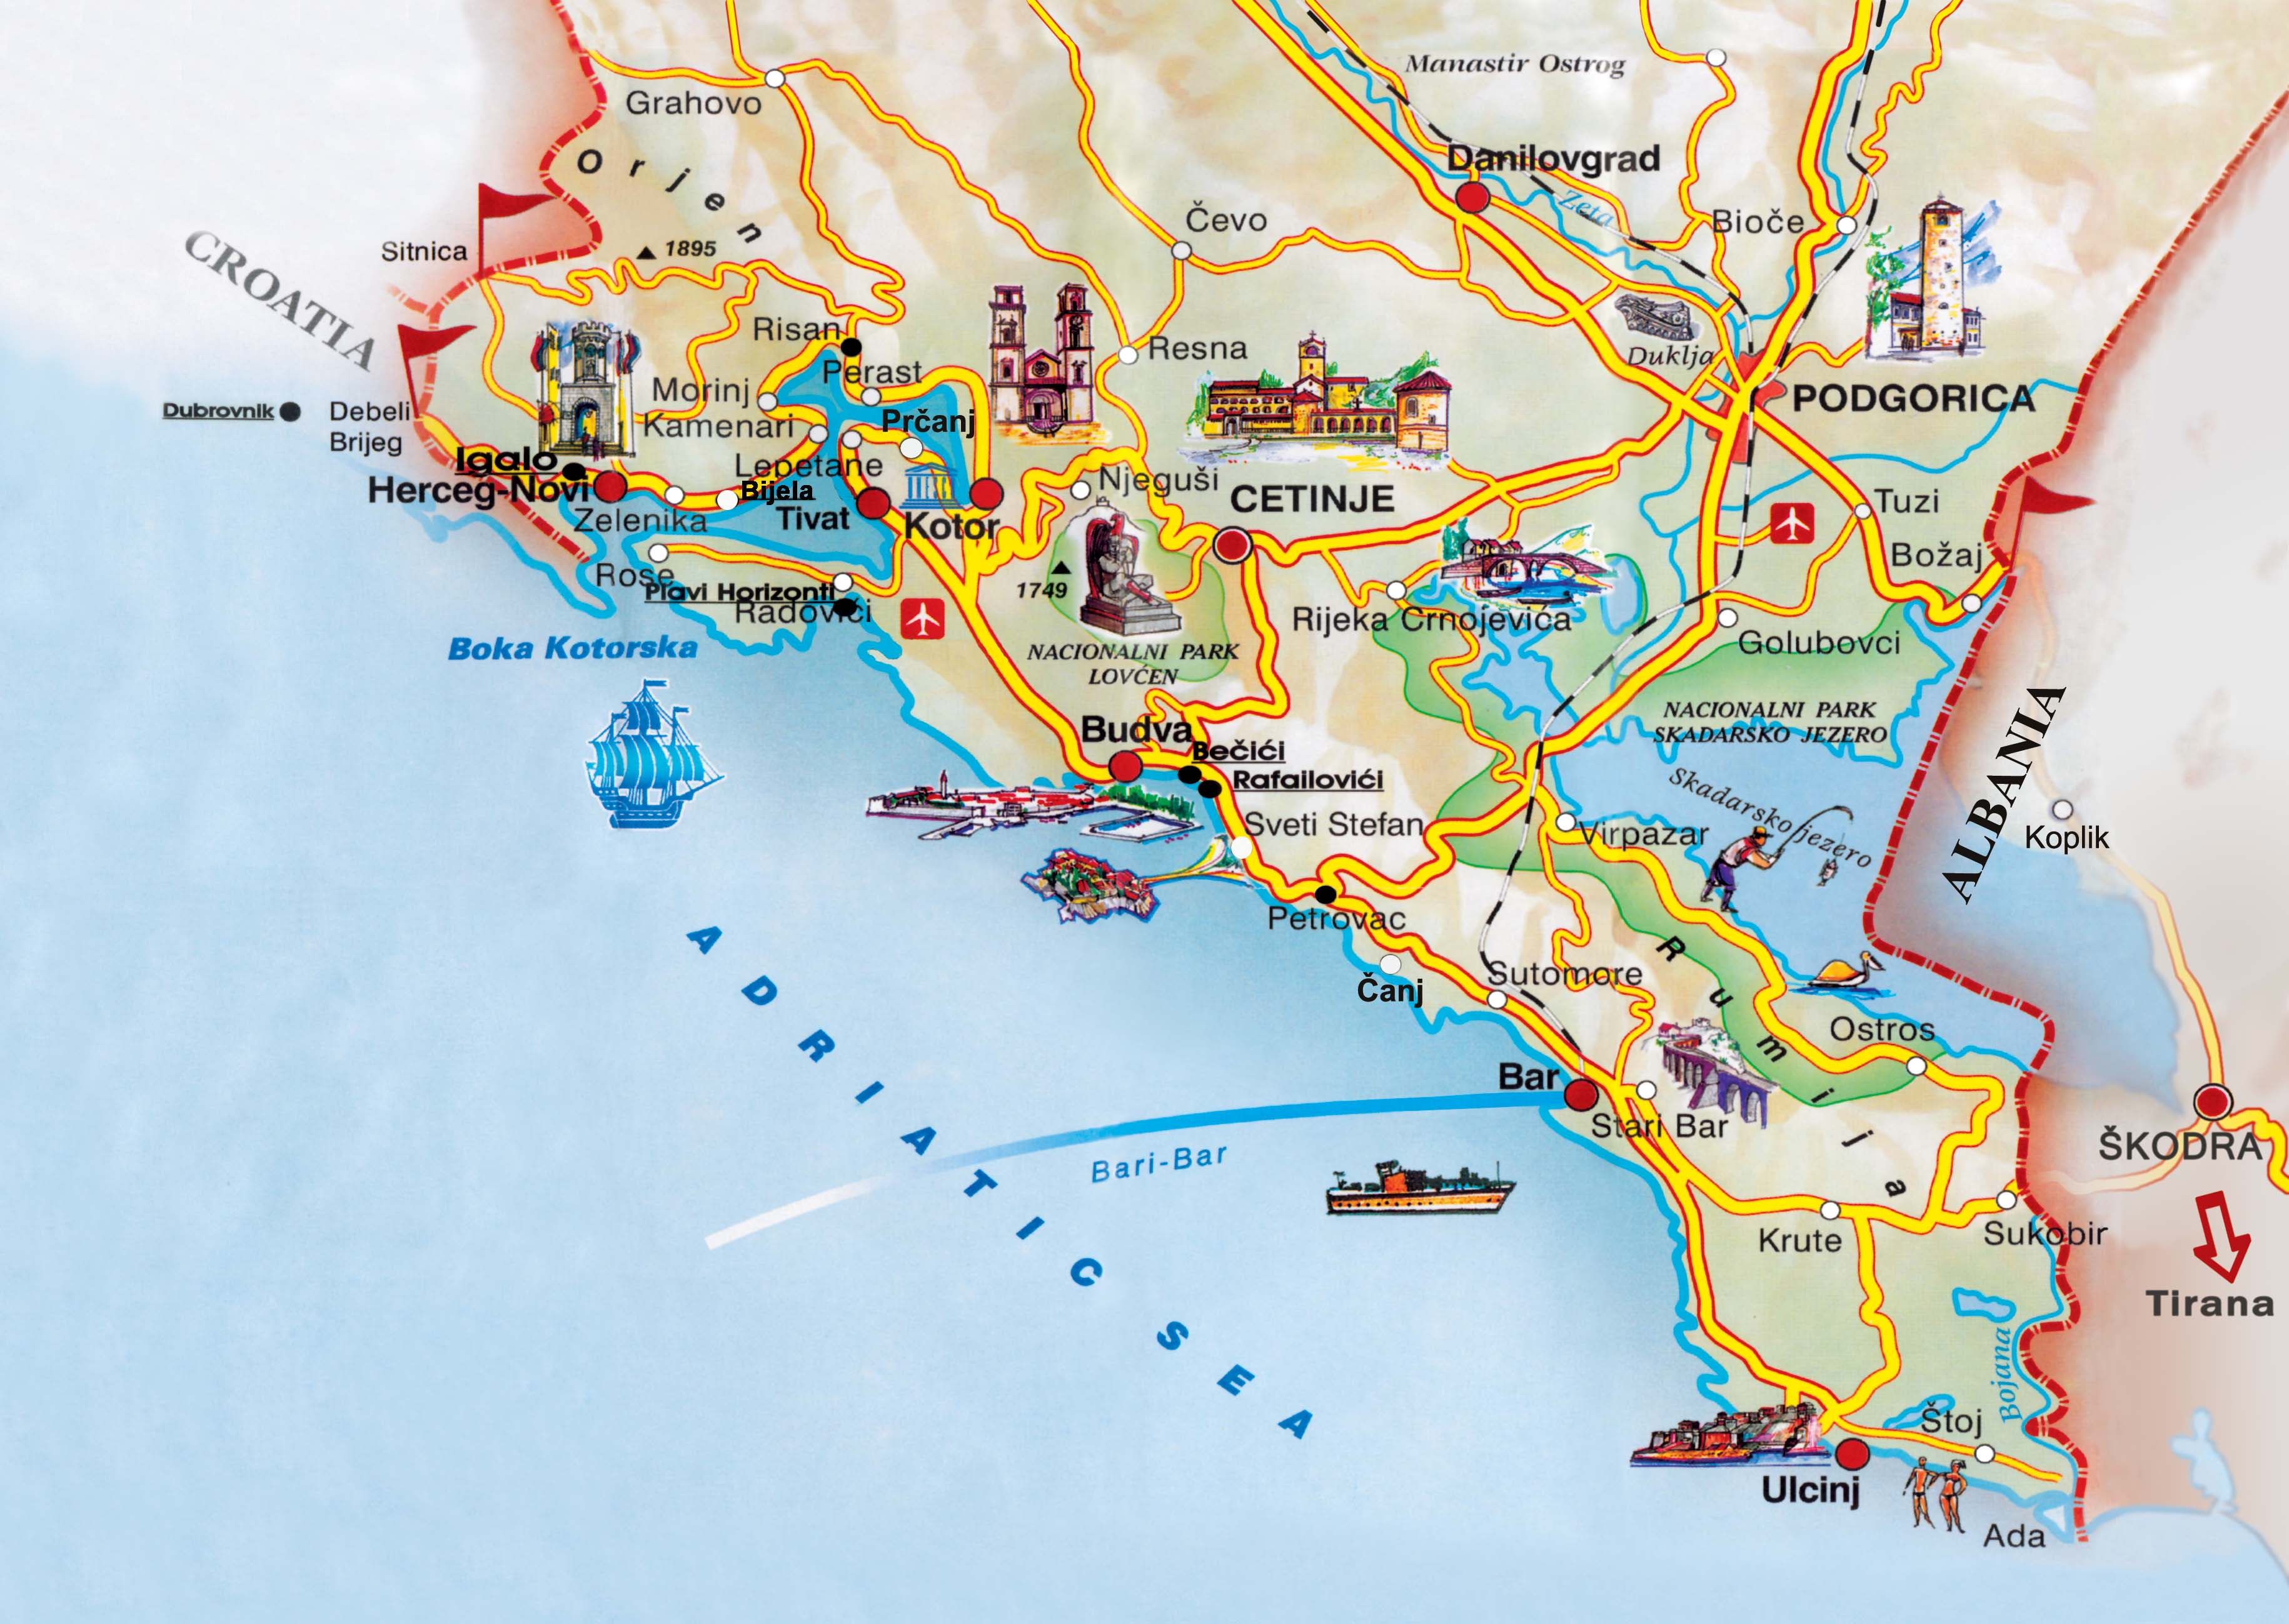 montenegró térkép Montenegro: Térkép Montenegro (kép) montenegró térkép